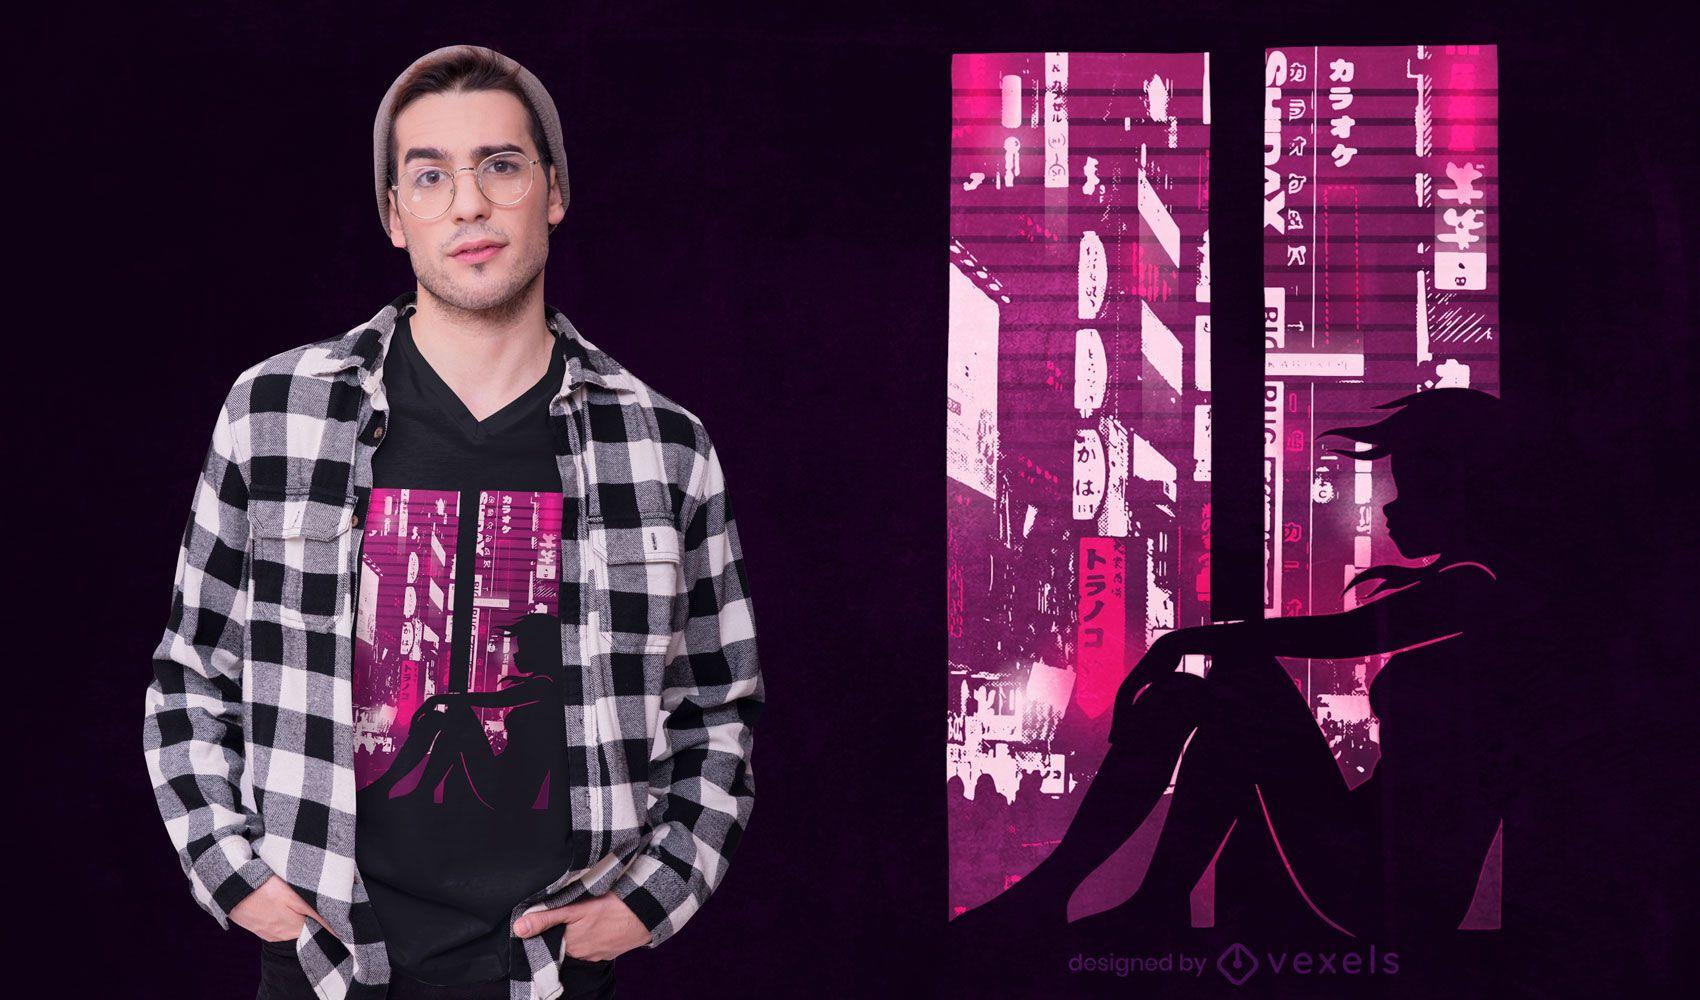 Diseño de camiseta Cyberpunk Girl Silhouette